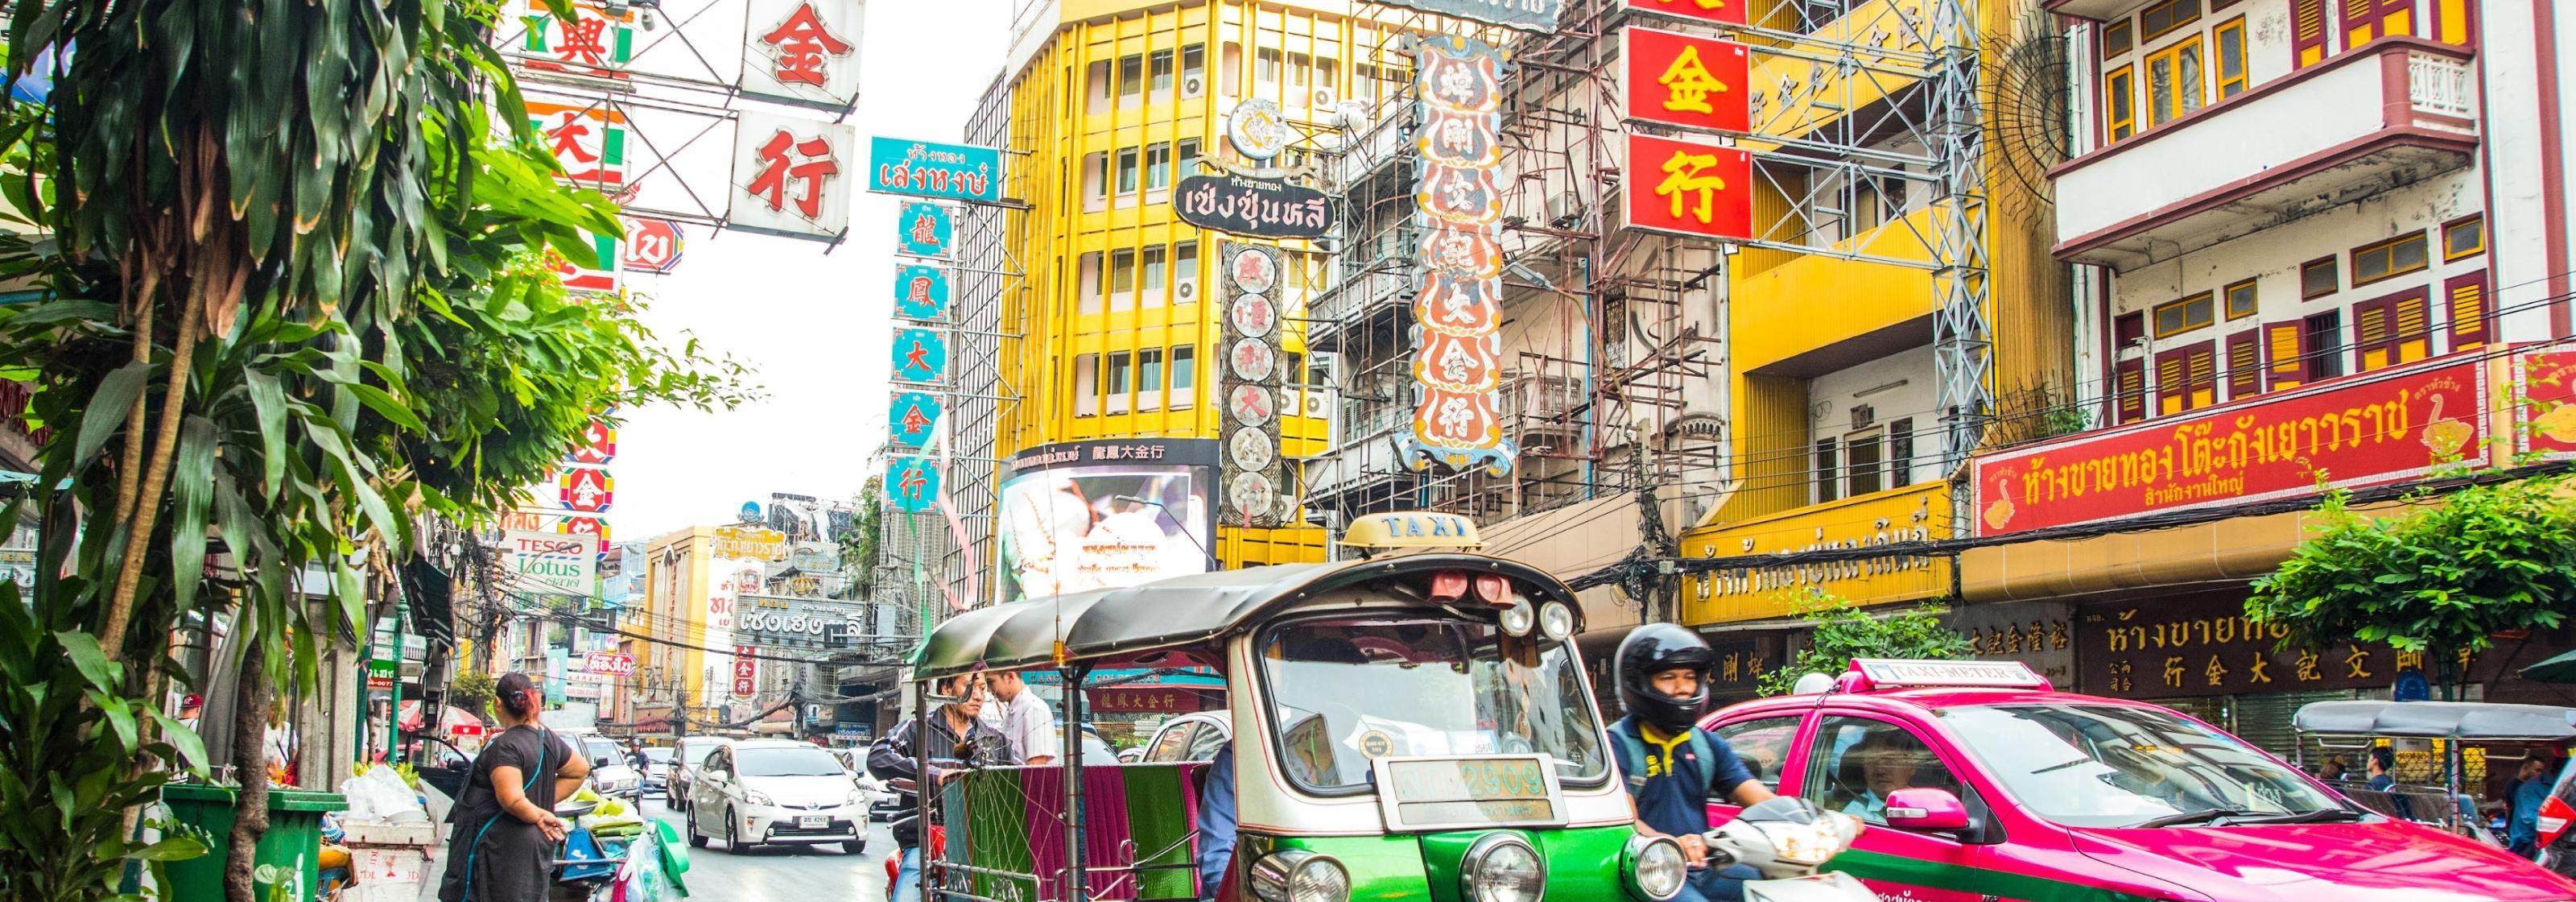 Choses à faire à Bangkok